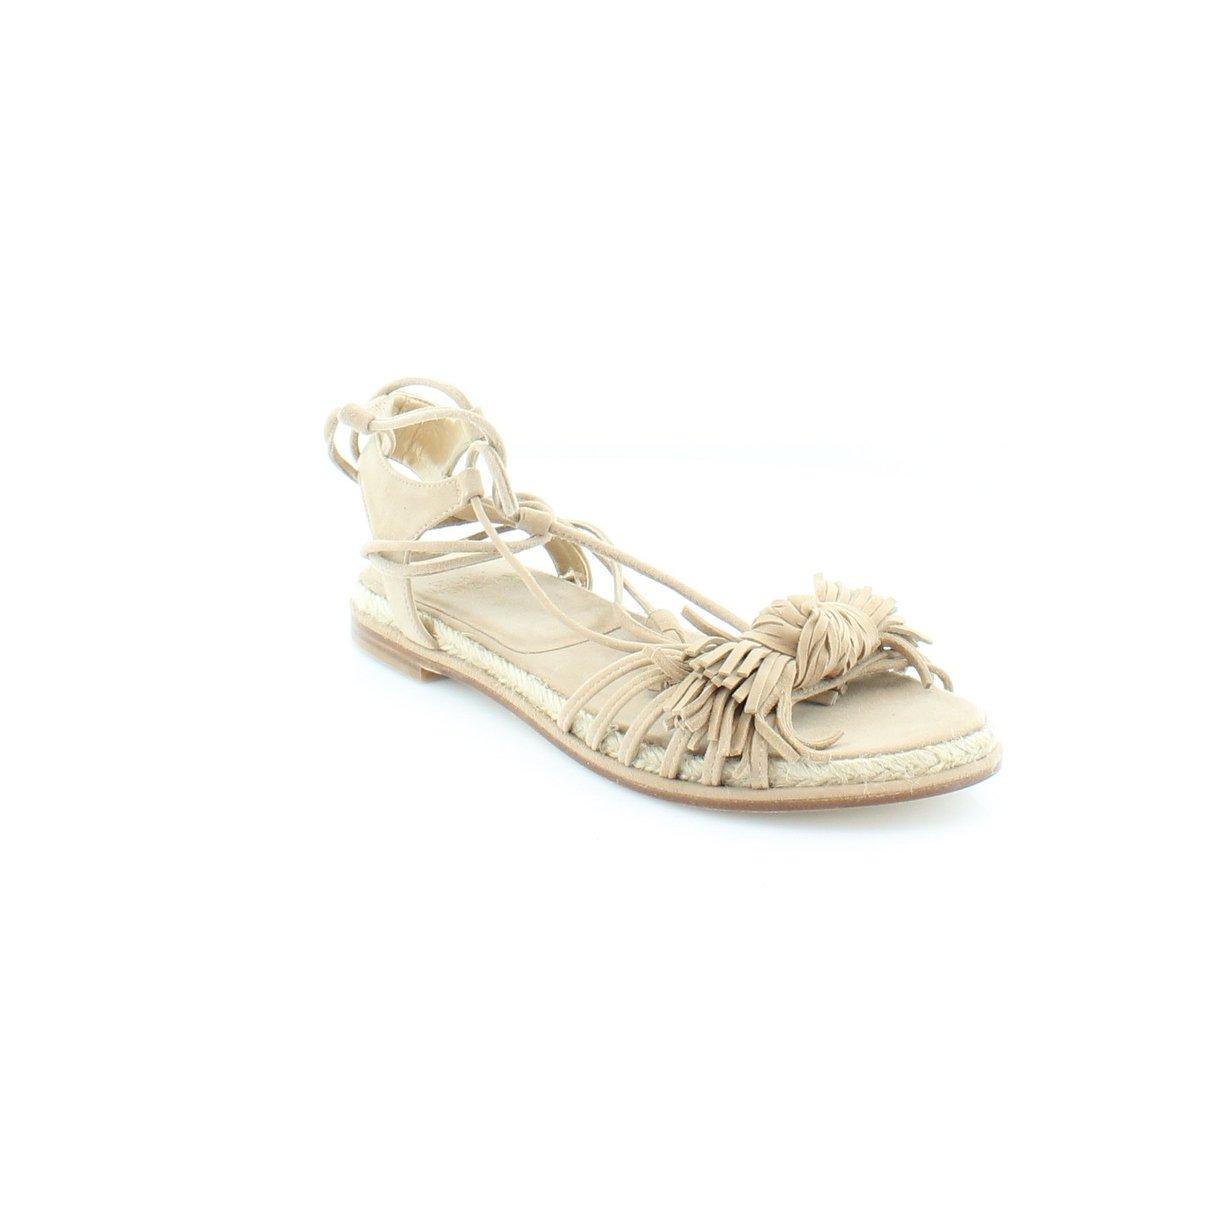 b94f0b0ca Details about Stuart Weitzman Flowerpot Womens Flat Sandals Cashew Suede 9  US   7 UK